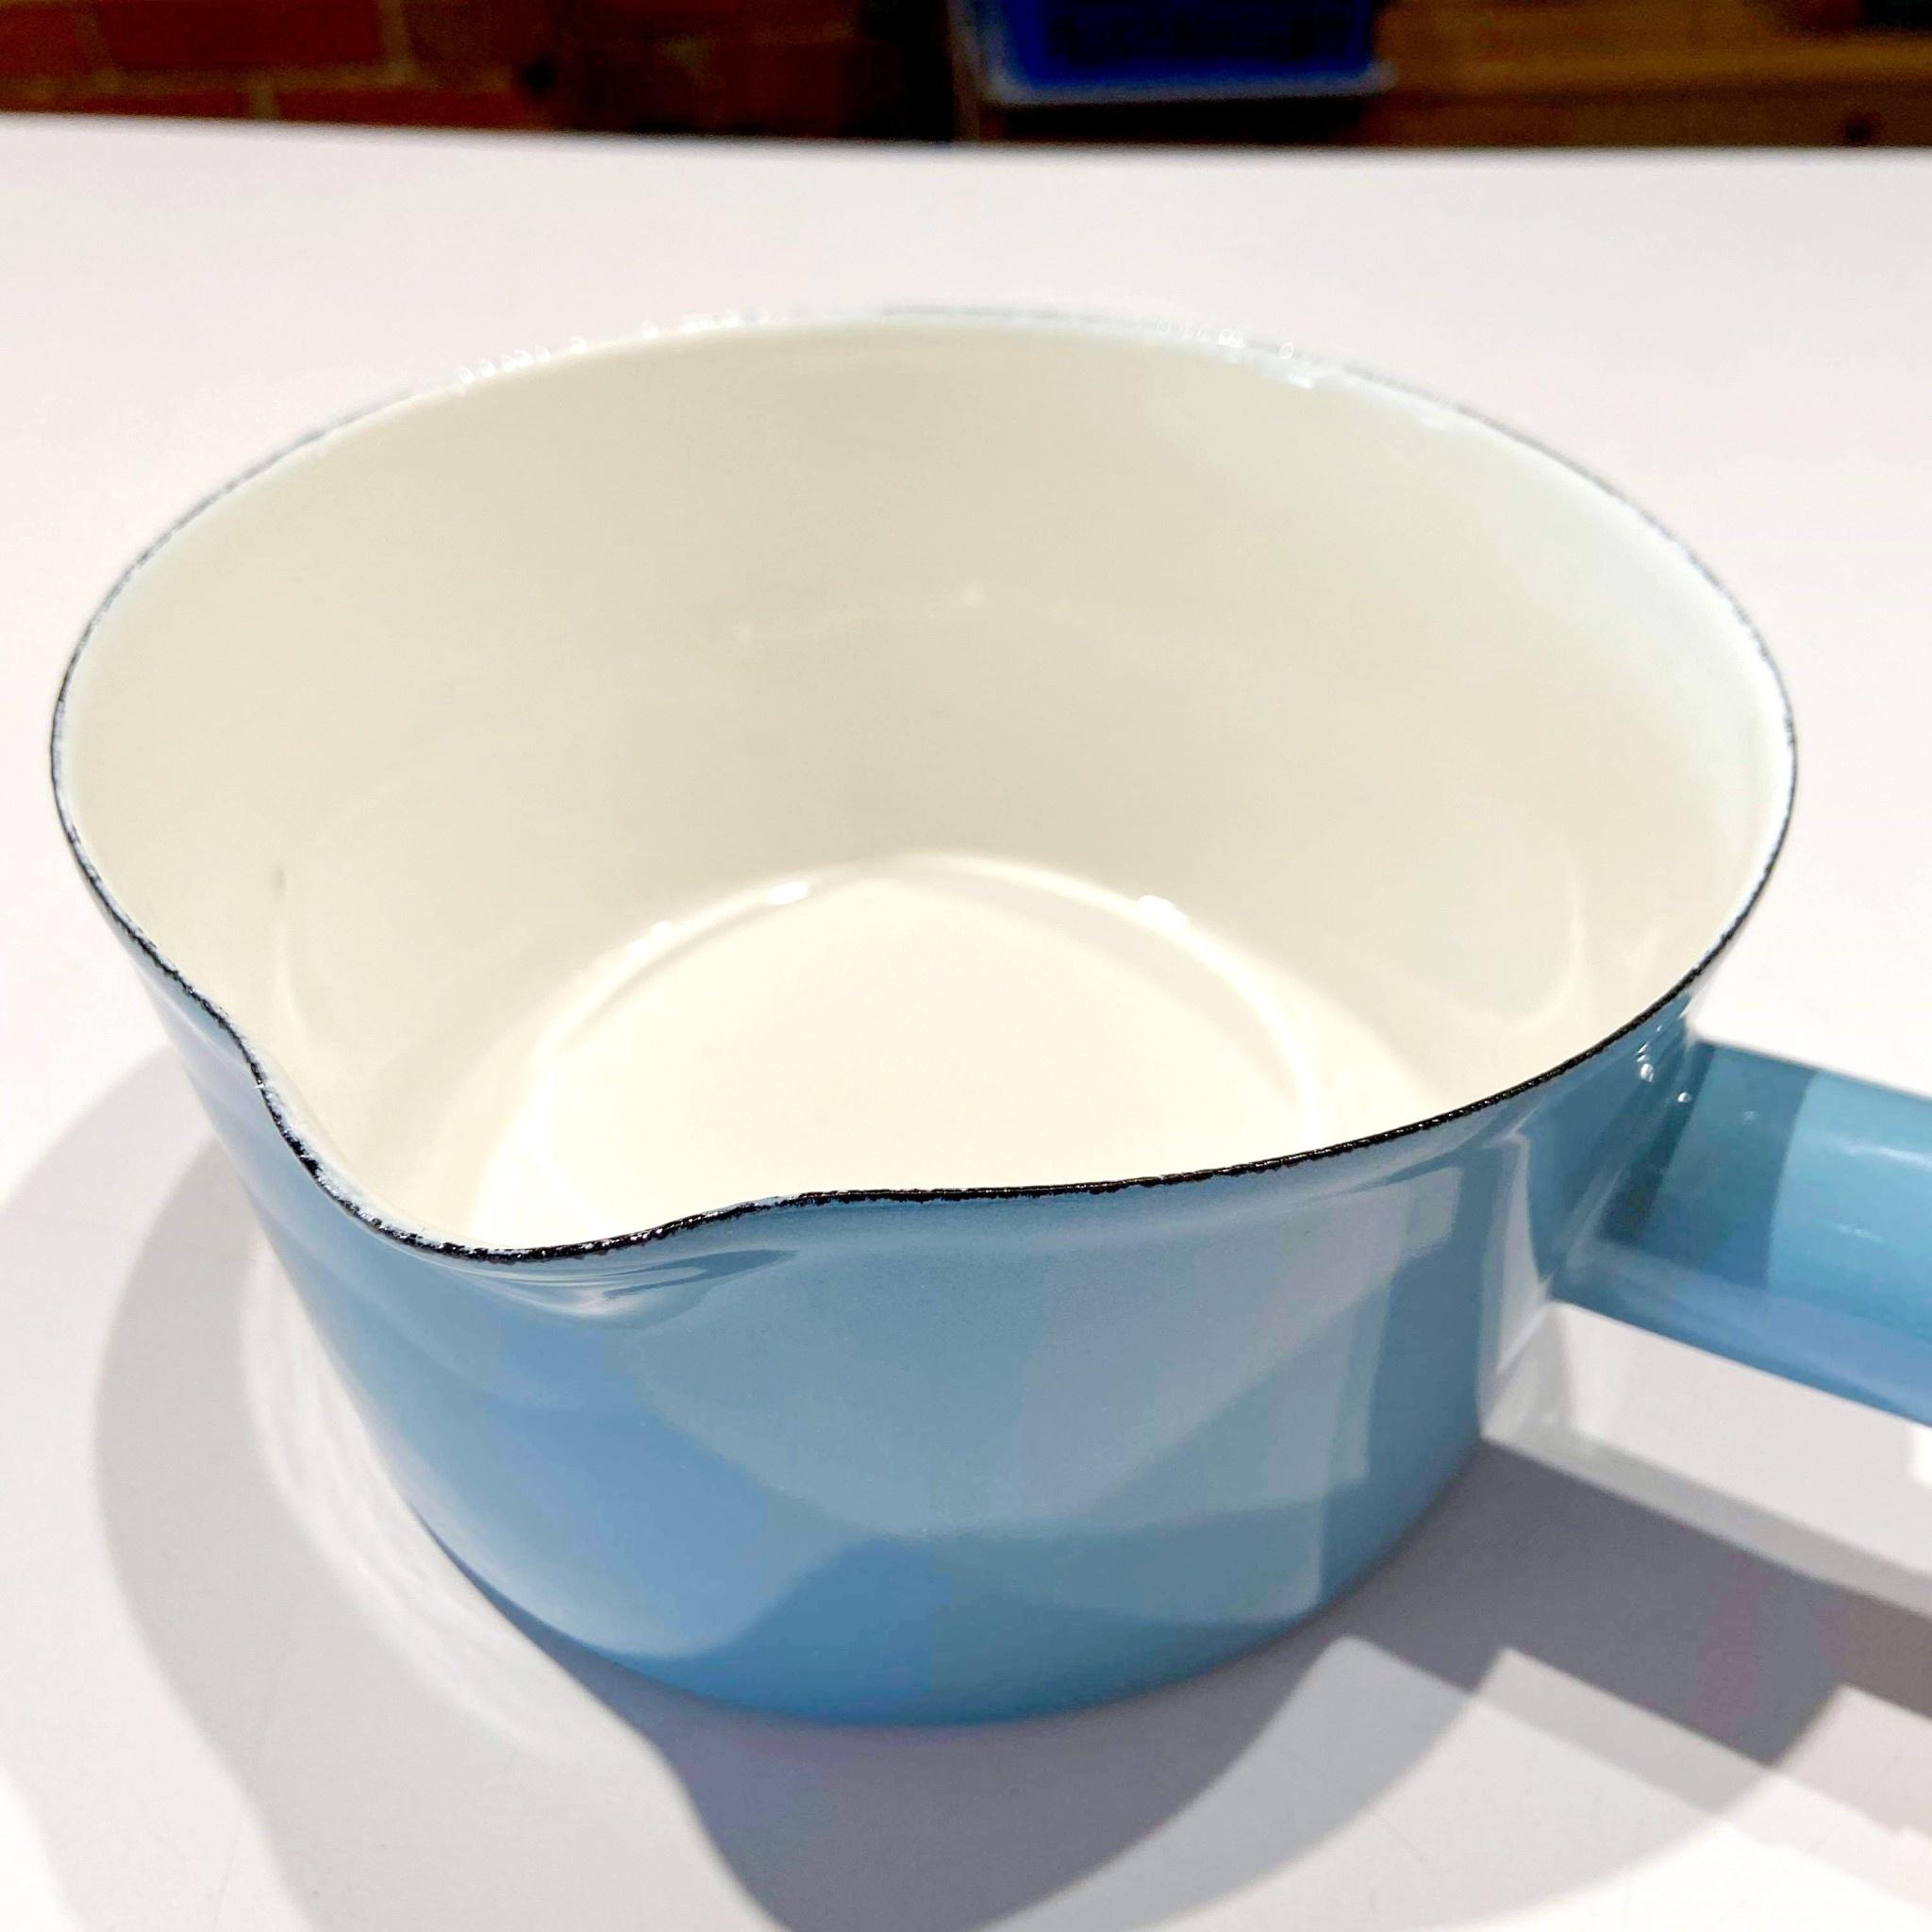 15cm Blue Pot with Wood Handle